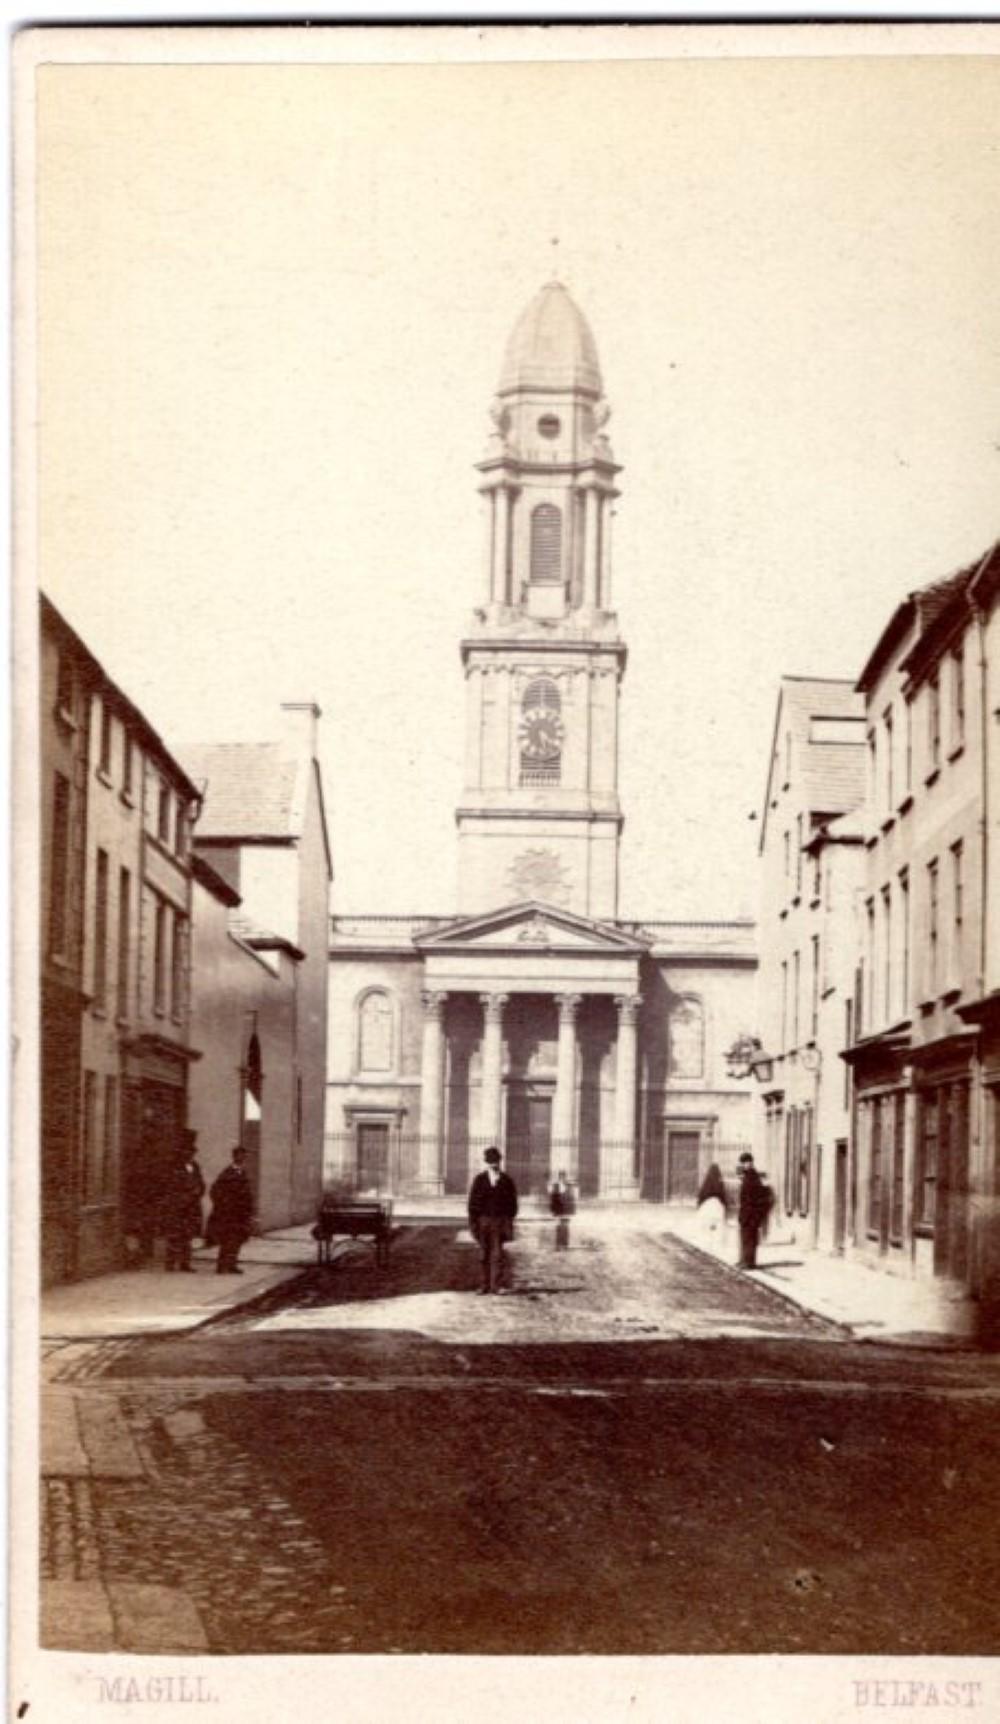 St. Anne's Church, Belfast, 1860s